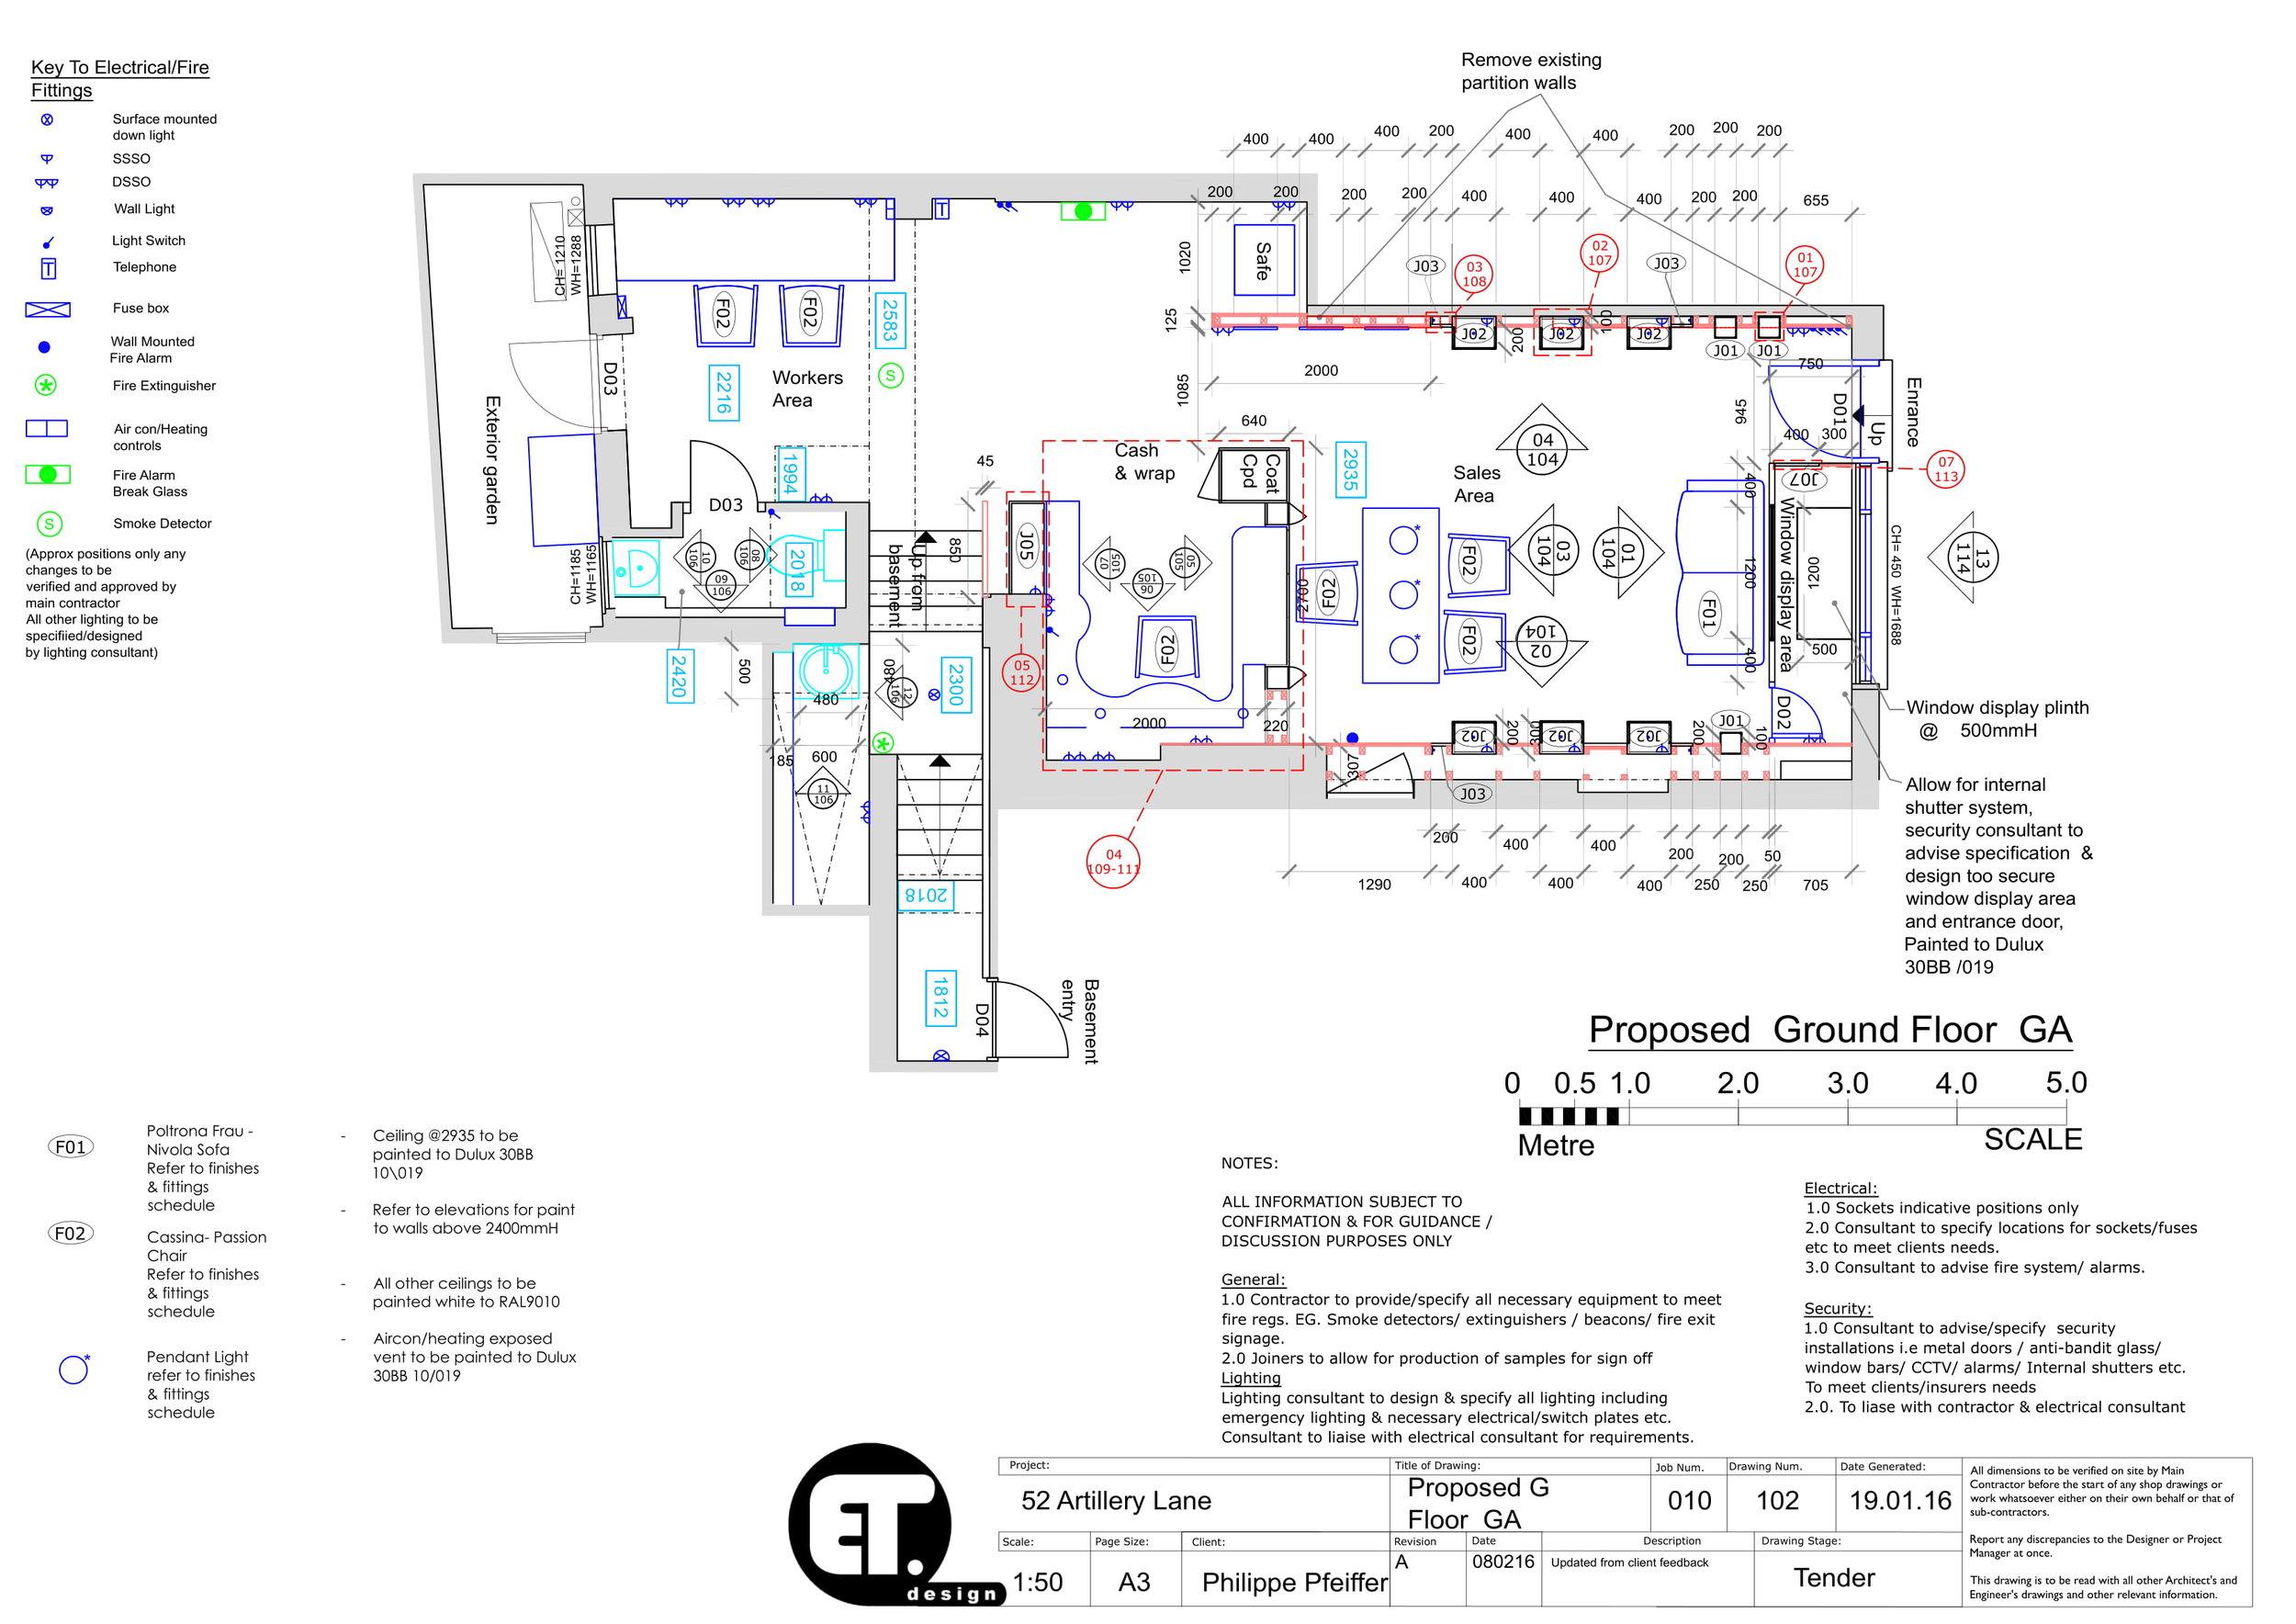 010 Philippe Pfeiffer Proposed GA G Floor  REV A 102-1.jpg